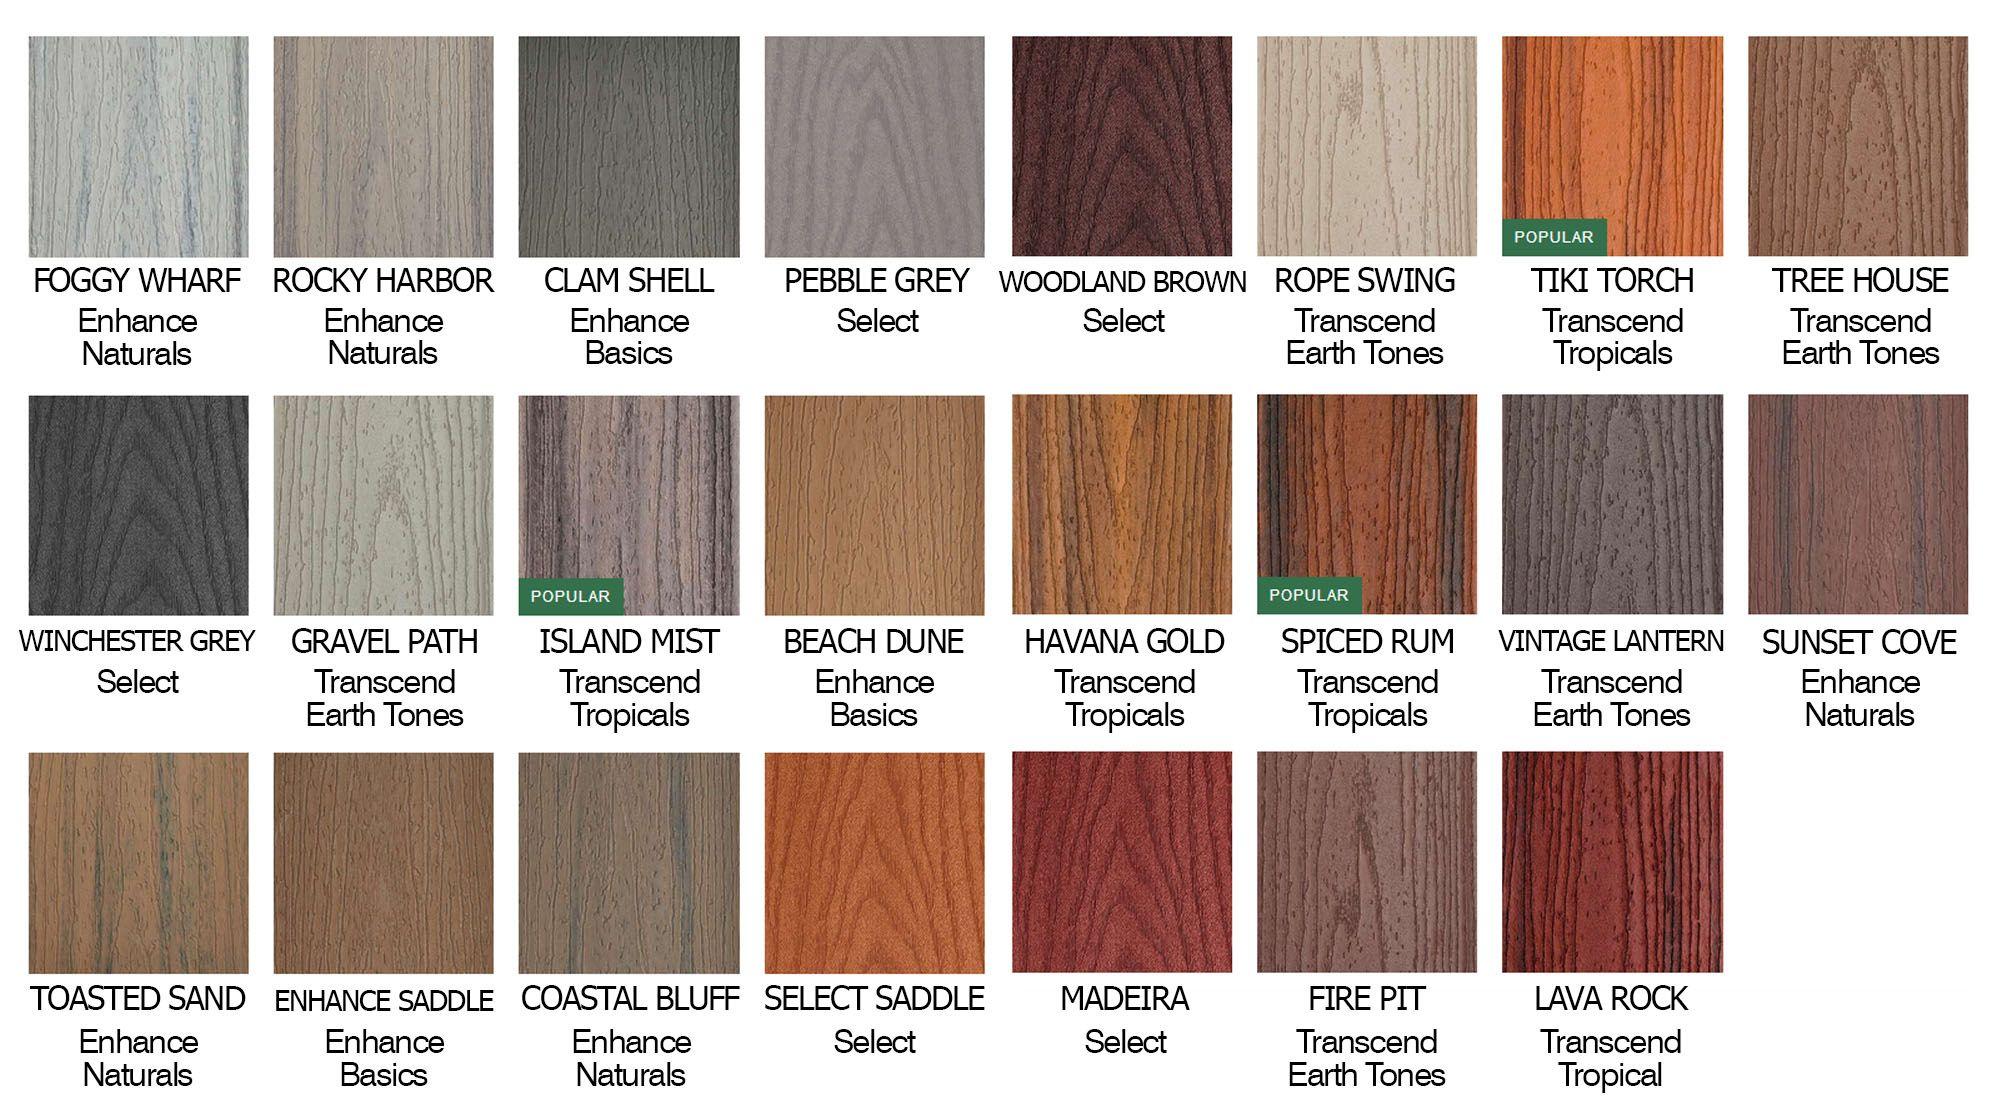 Trex Vs Timbertech Decking Pros Cons Gambrick Trex Deck Colors Trex Vs Timbertech Trex Deck